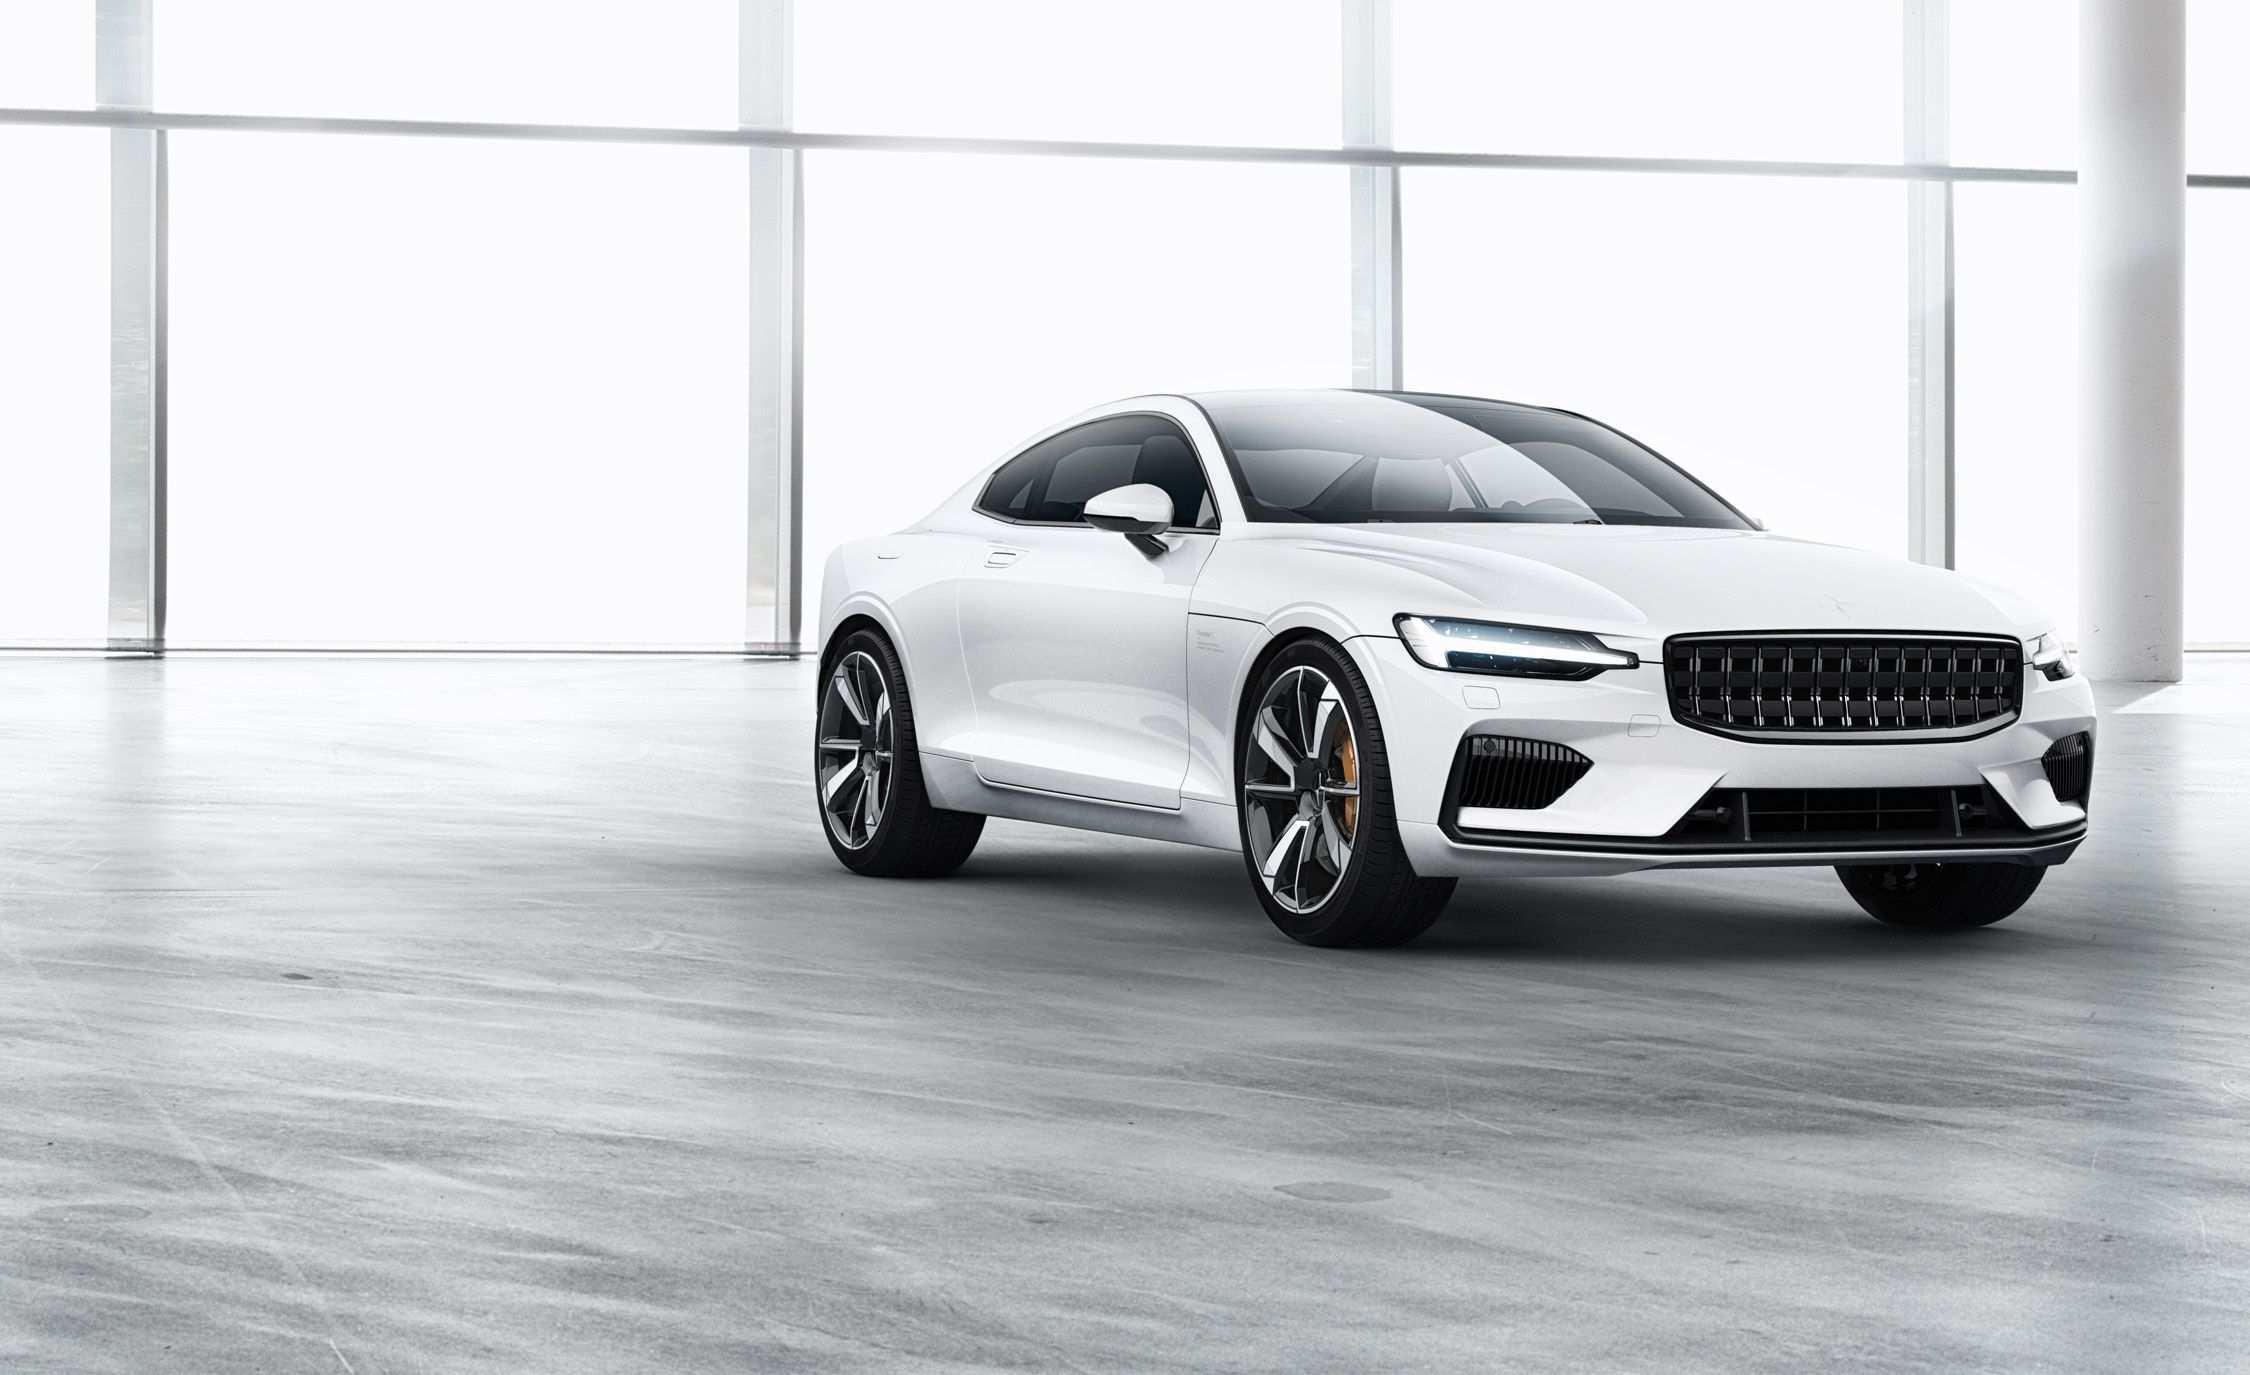 17 New 2020 Volvo V90 Specification Rumors for 2020 Volvo V90 Specification